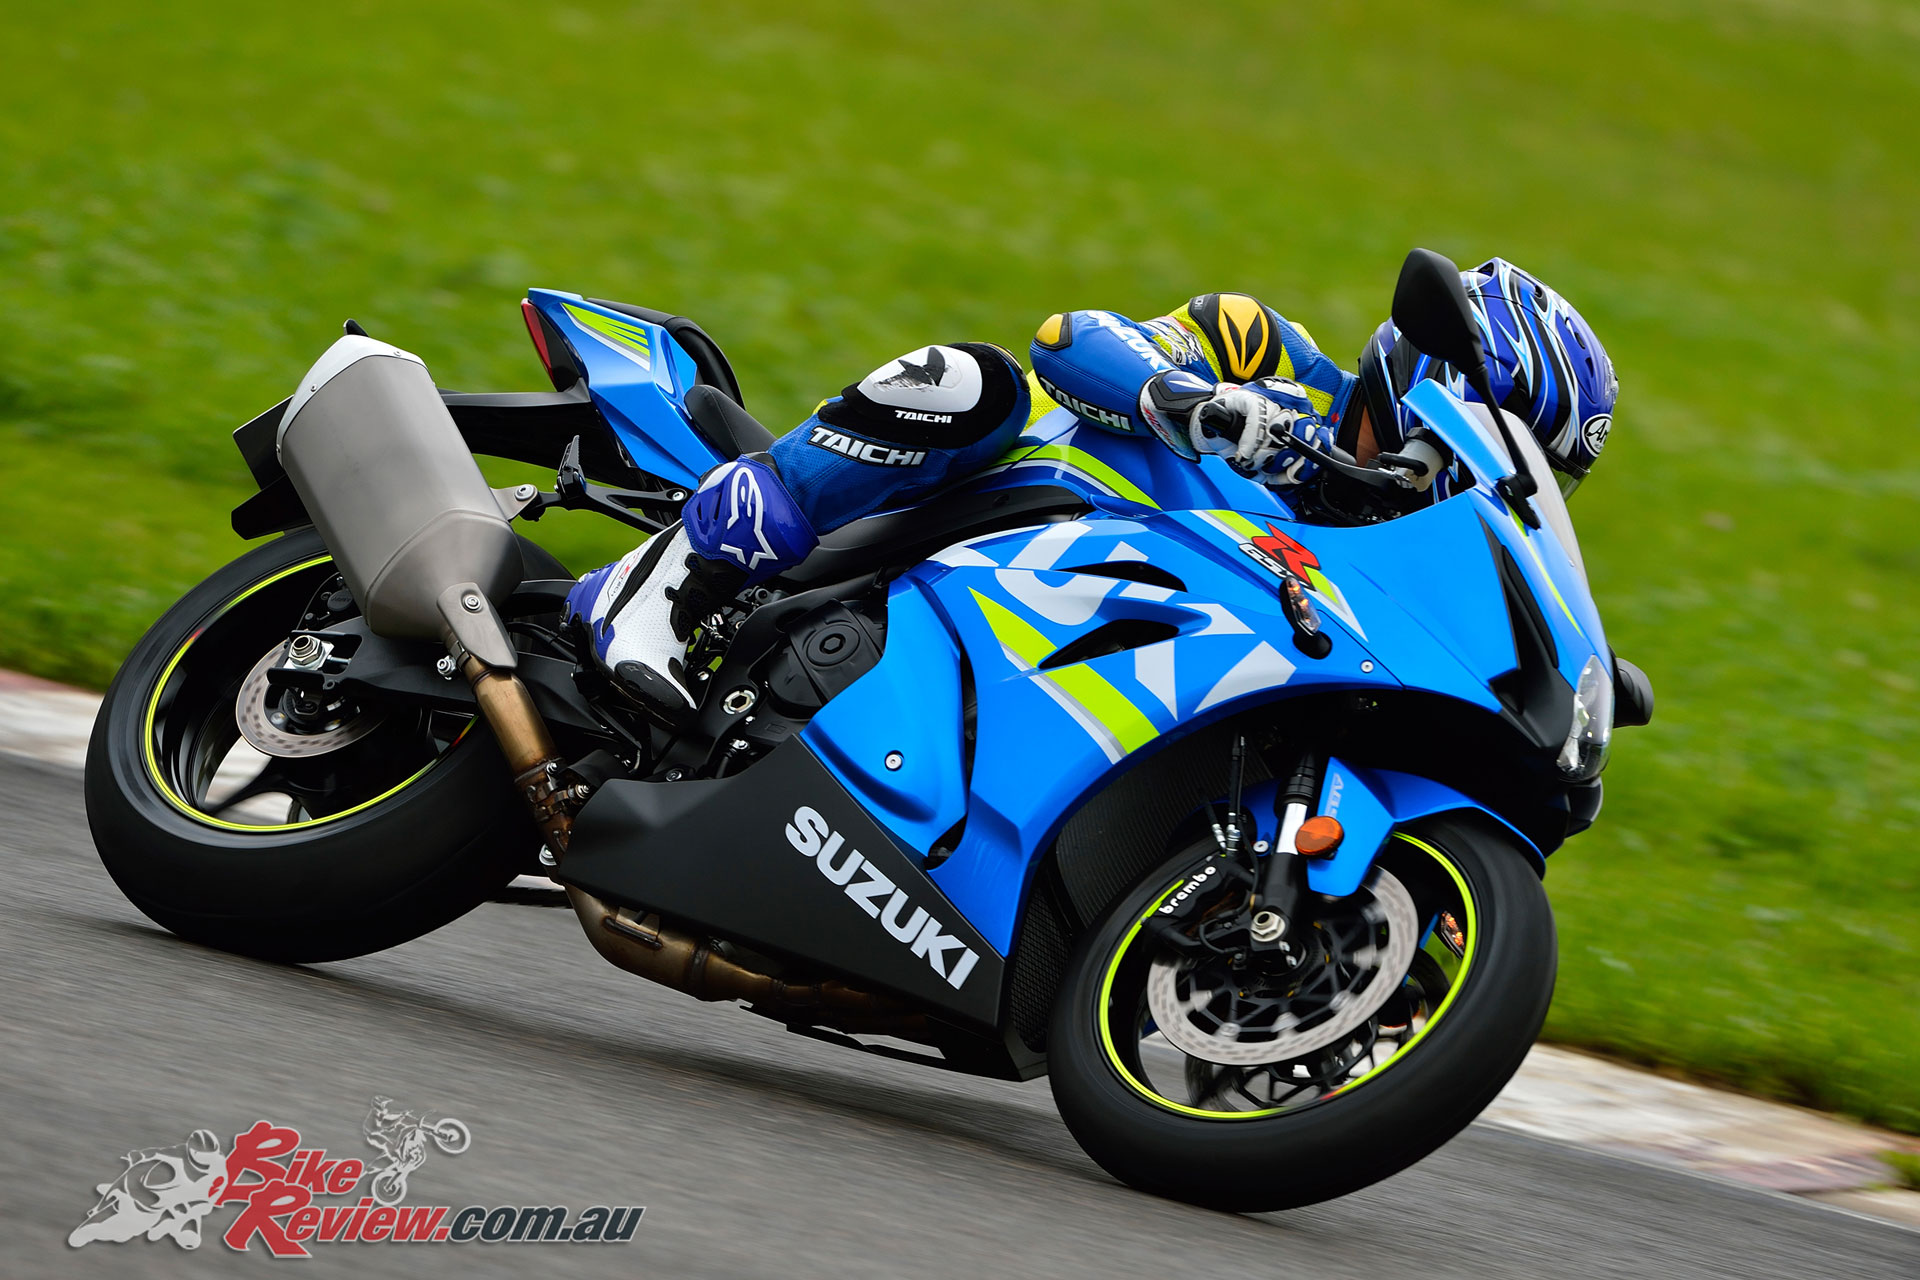 Suzuki Track Day Experience Events announced